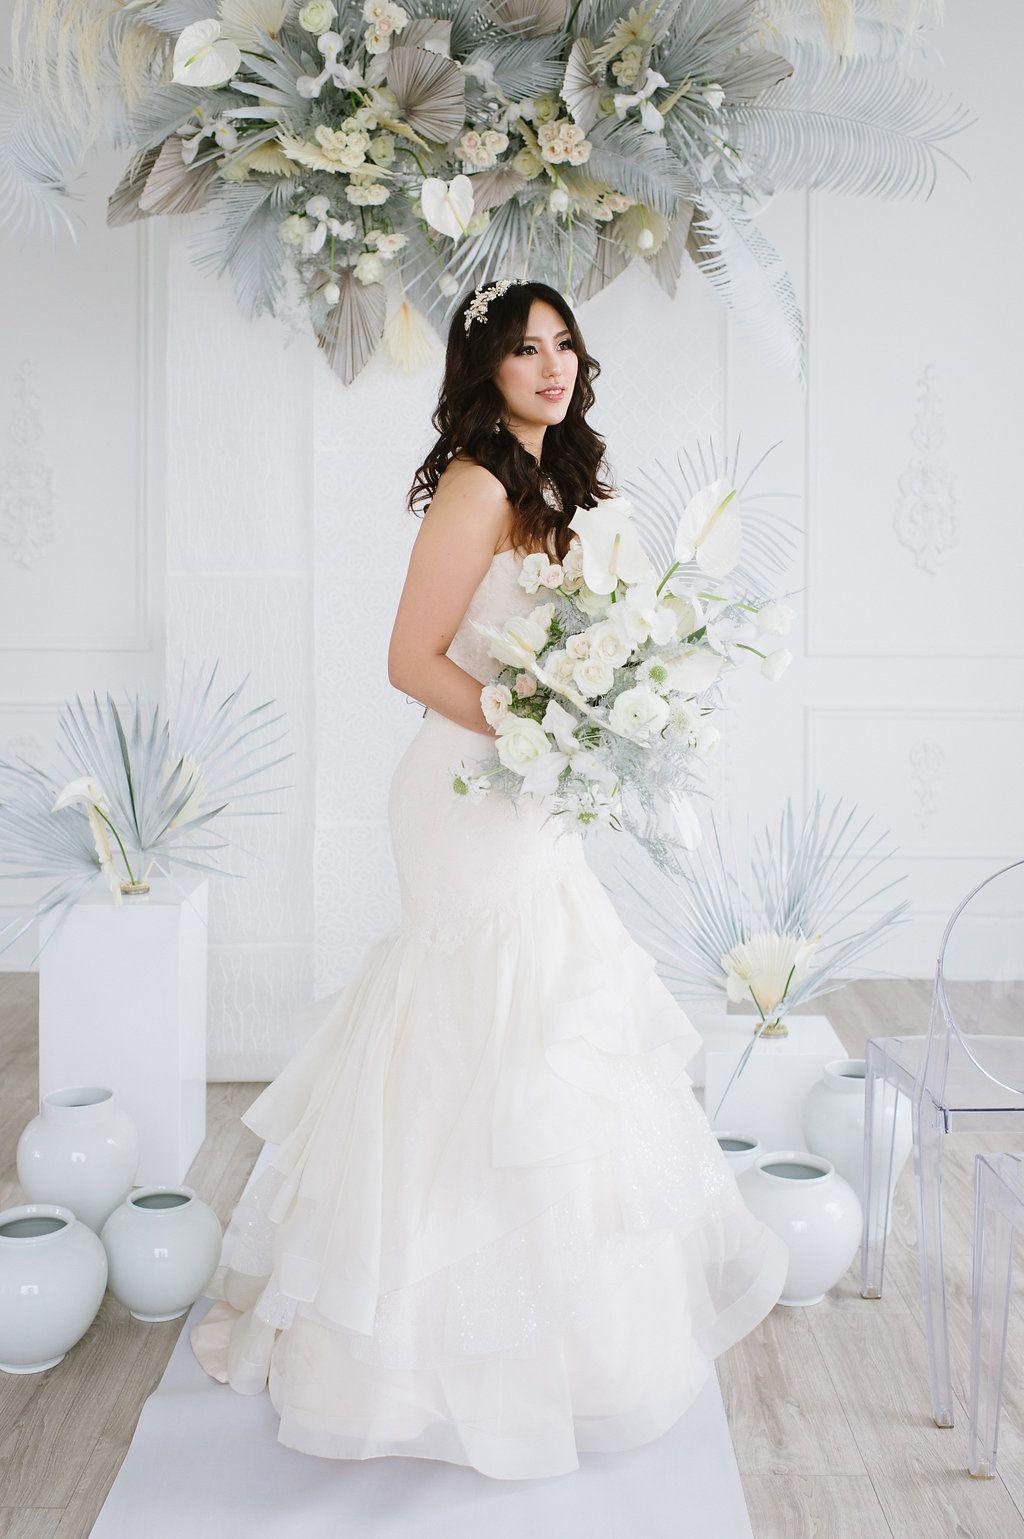 Modern Lux White Wedding Editorial Inspired By Korean Fashion Wedding Wedding Inspiration Shoot White Wedding [ 1539 x 1024 Pixel ]